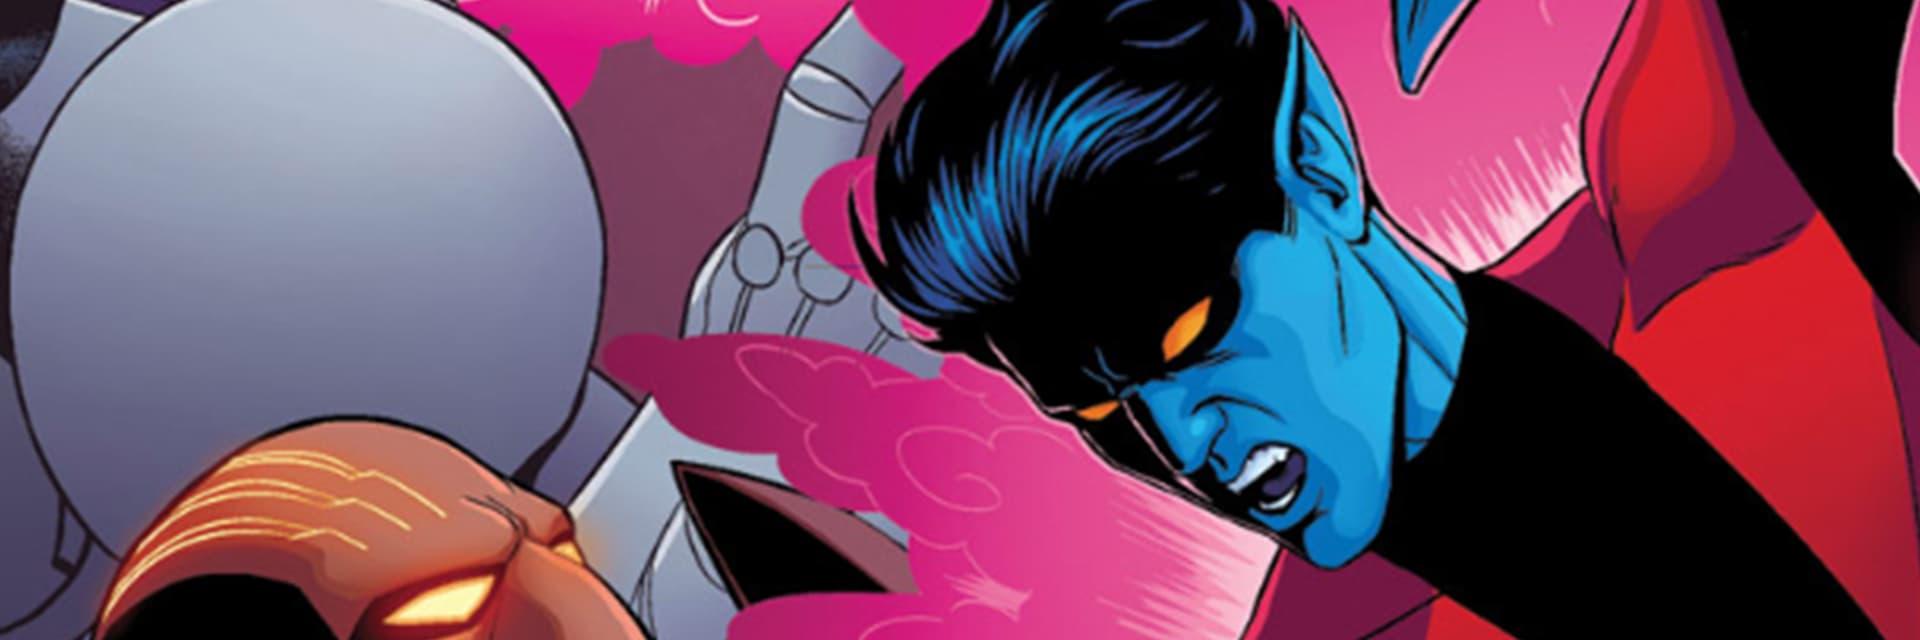 Nightcrawler (Kurt Wagner) Powers, Enemies, & History | Marvel